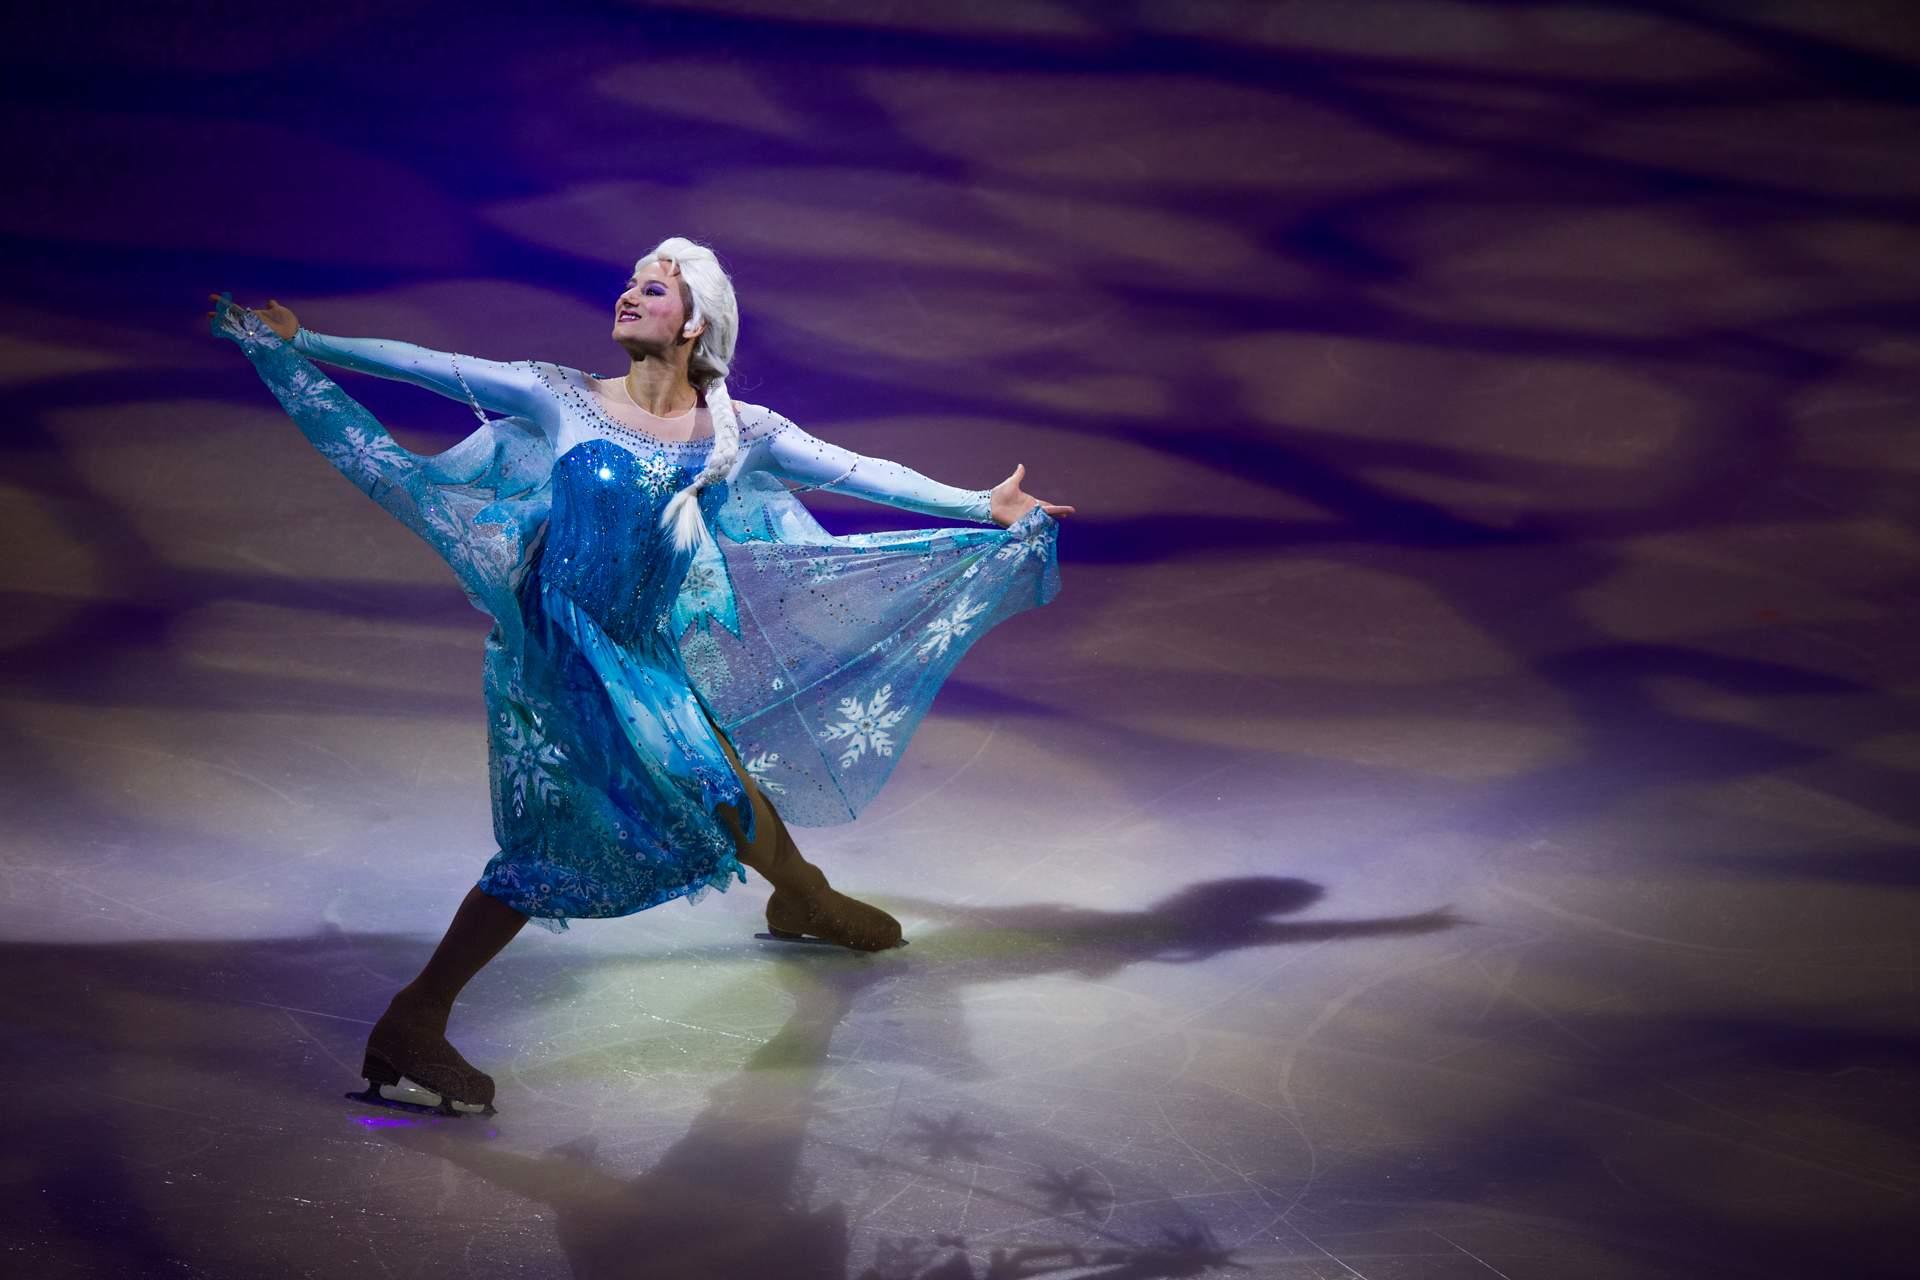 Elsa dancing and skating on ice